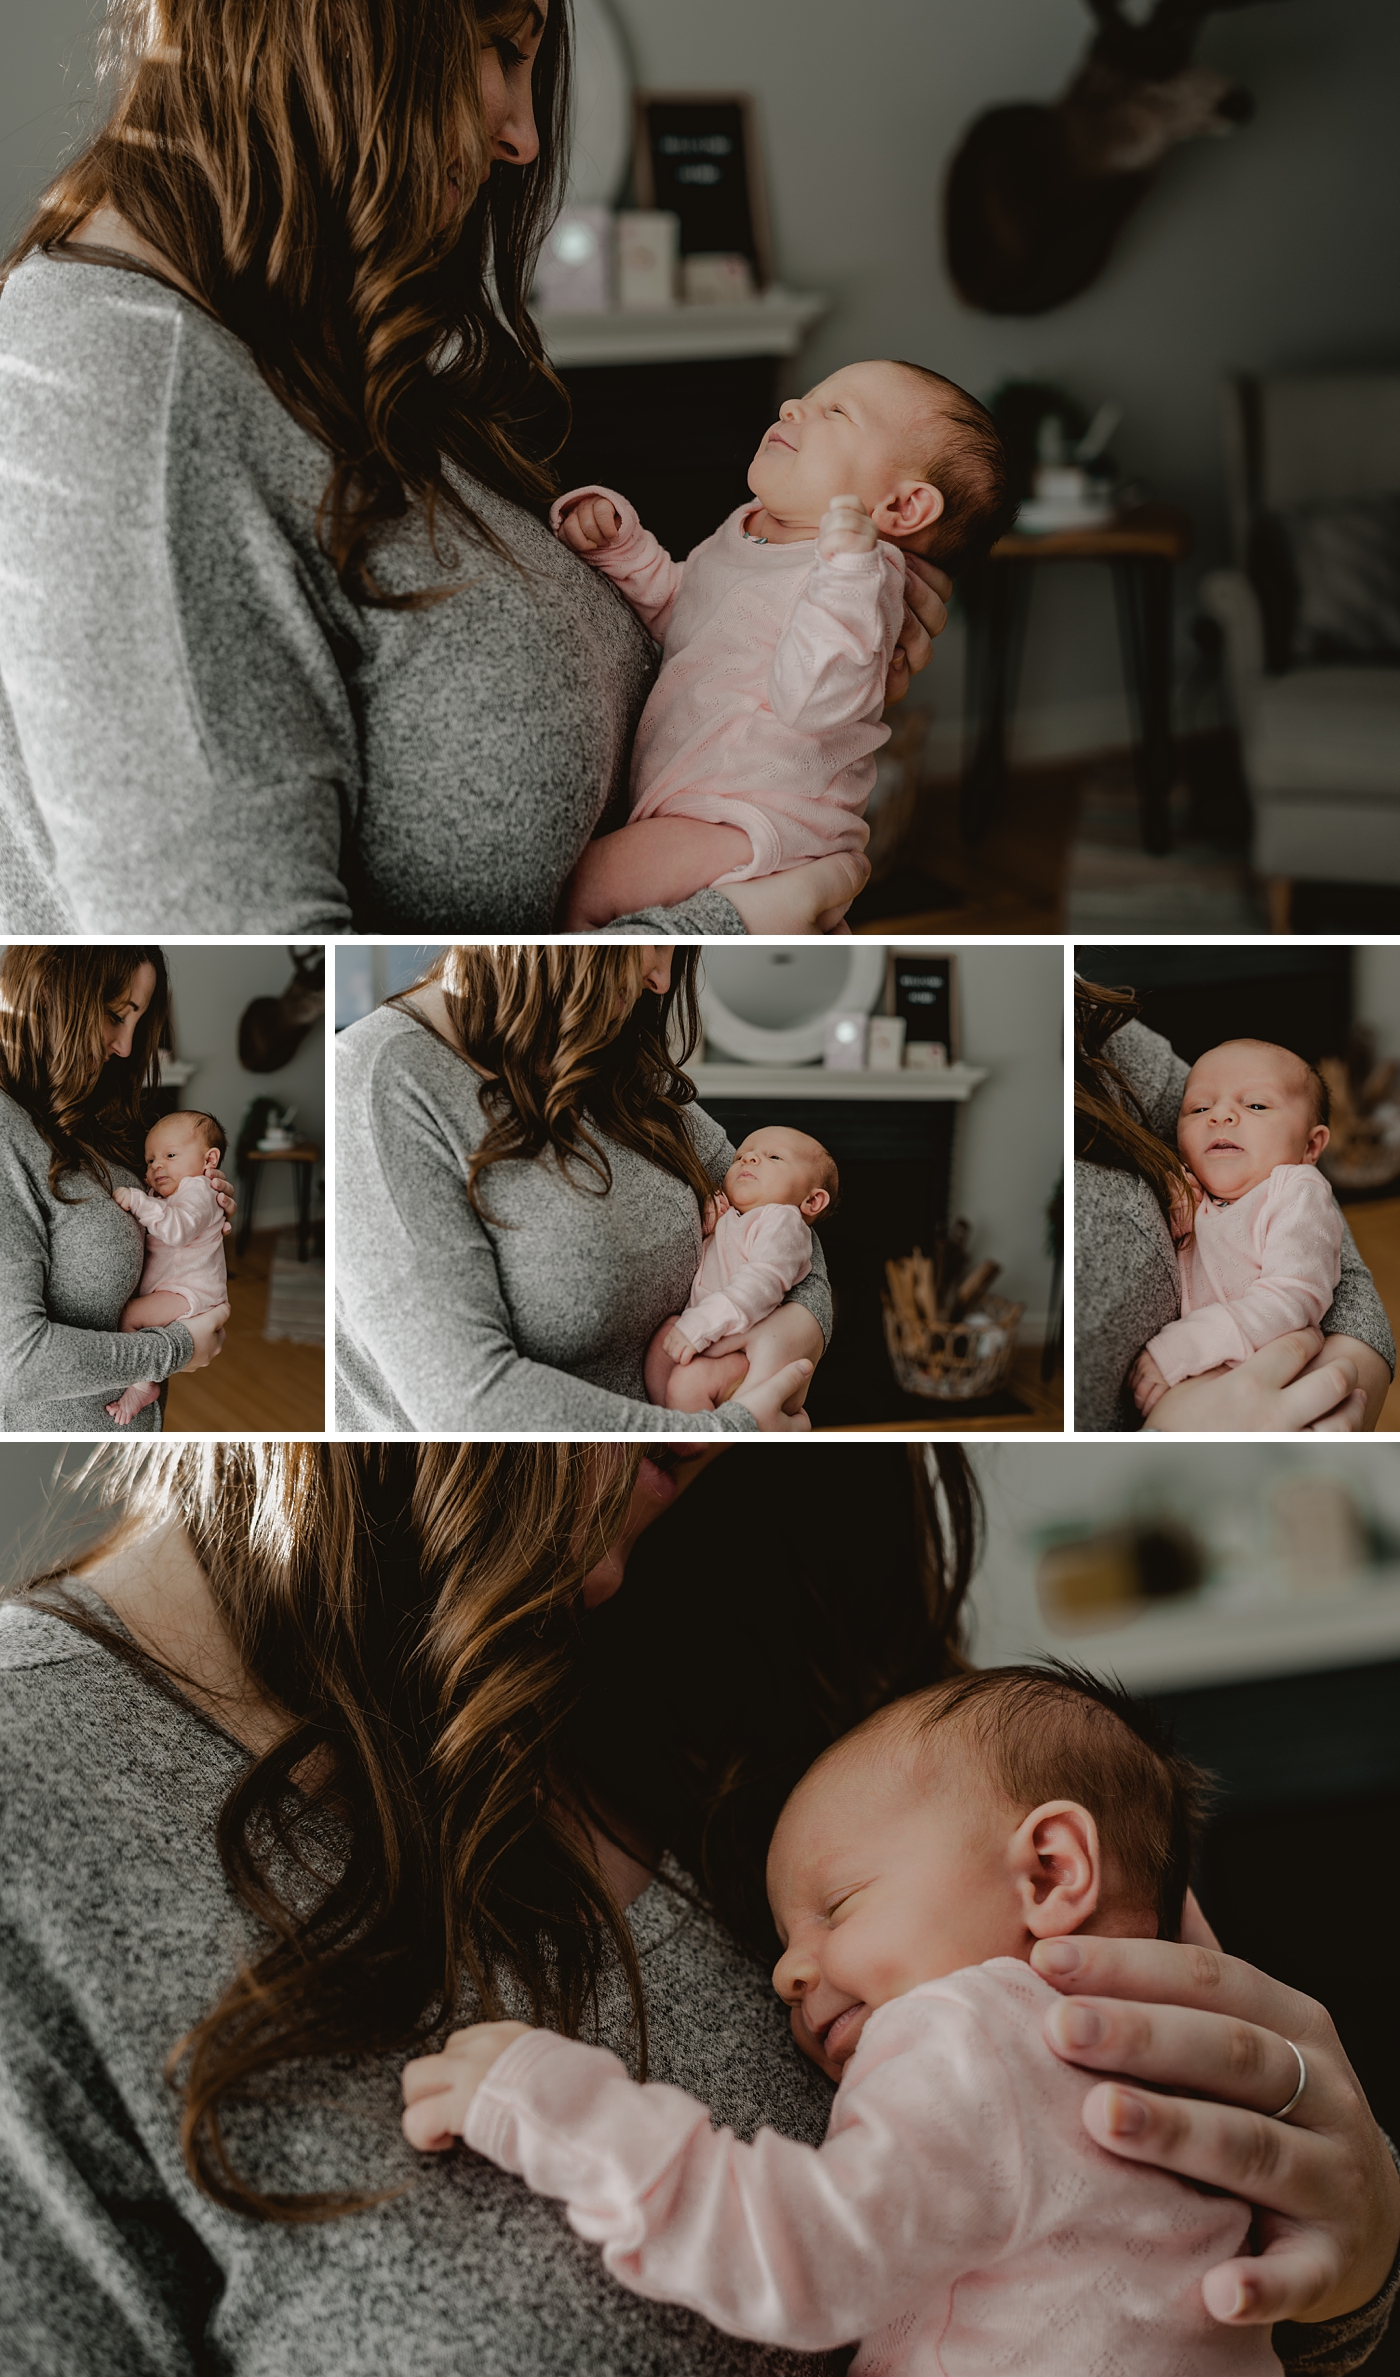 Cozy-Home-Lifestyle-Newborn-Photography_0029.jpg